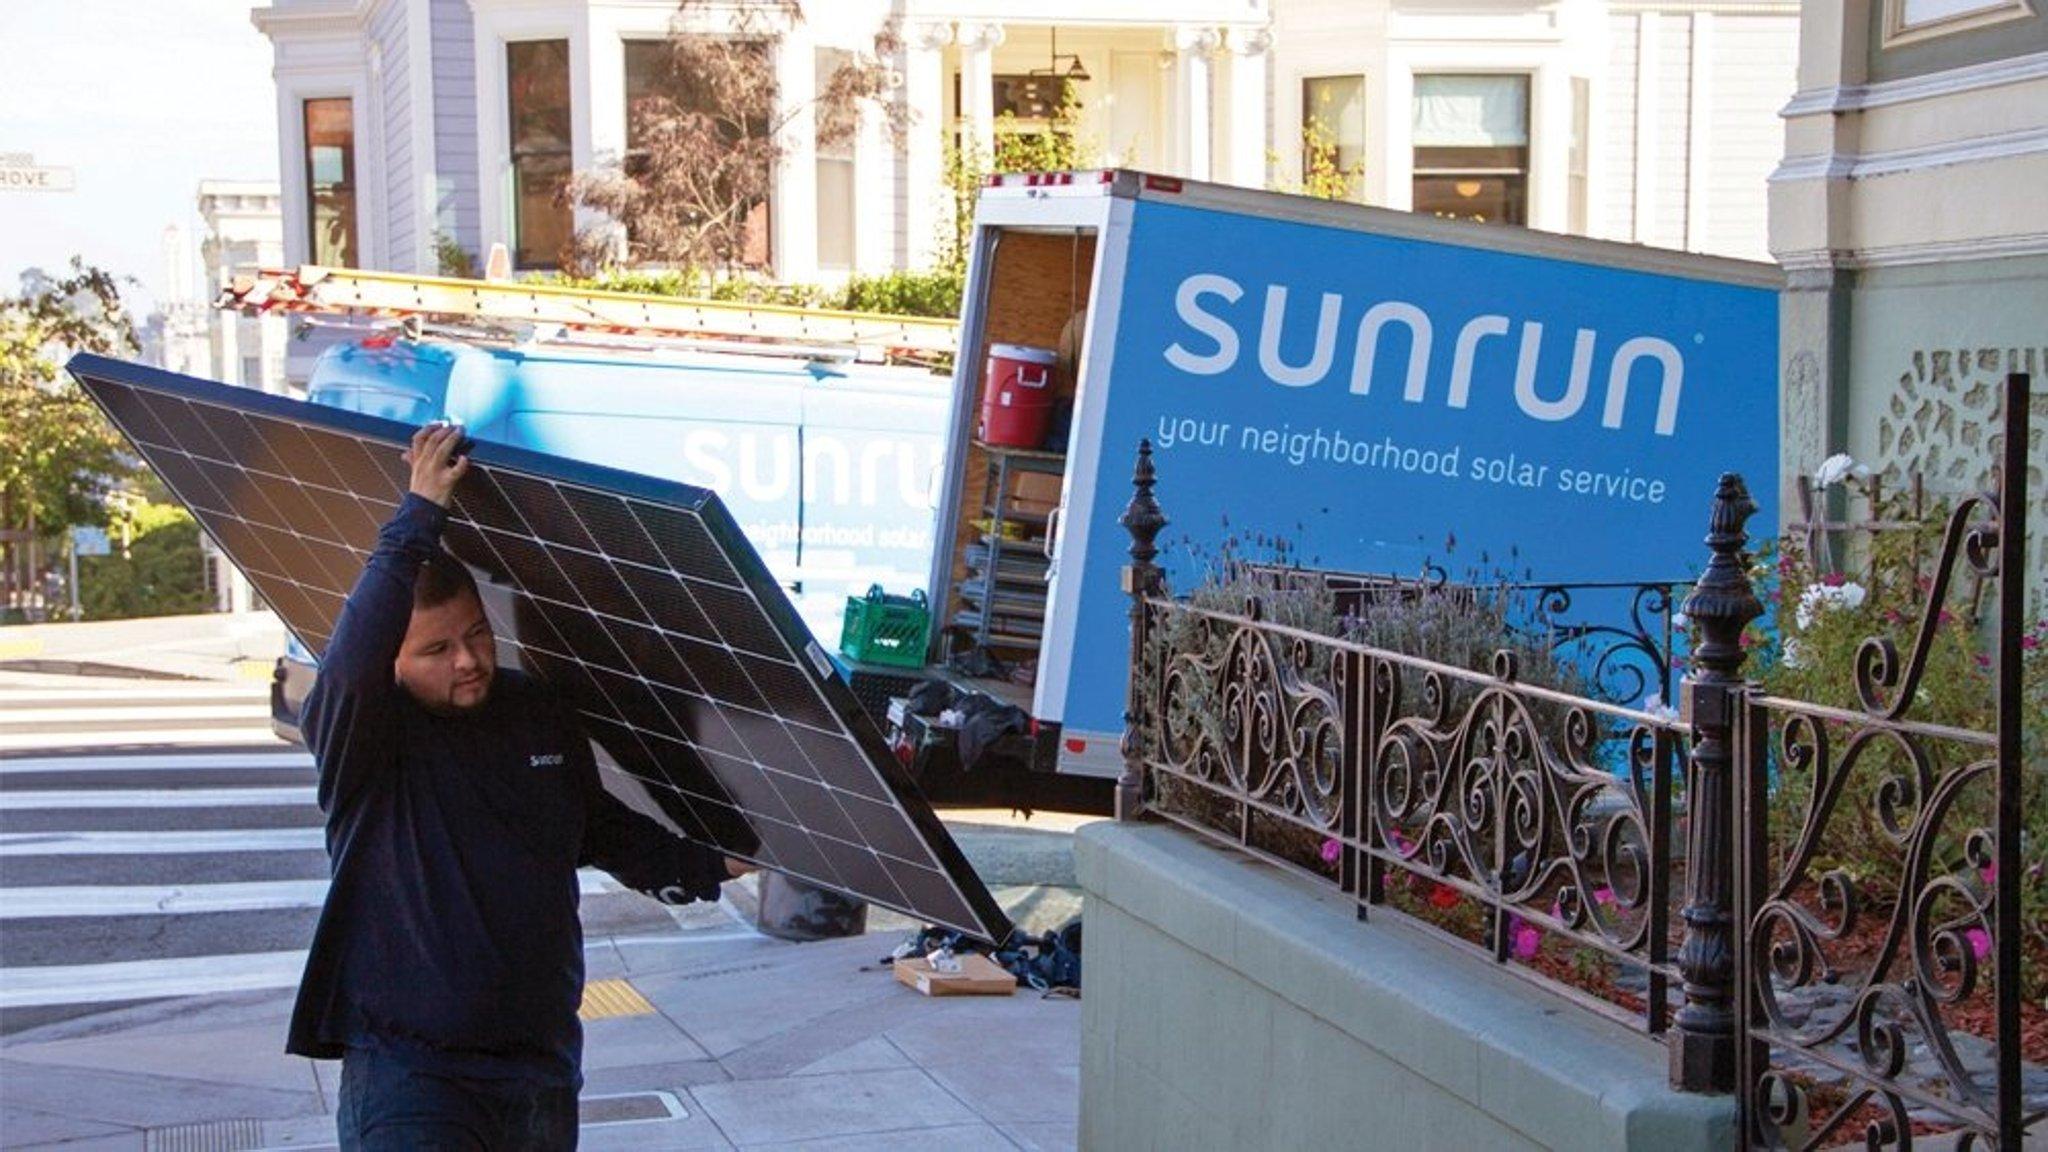 Comcast and Sunrun strike solar panel sales deal | Financial